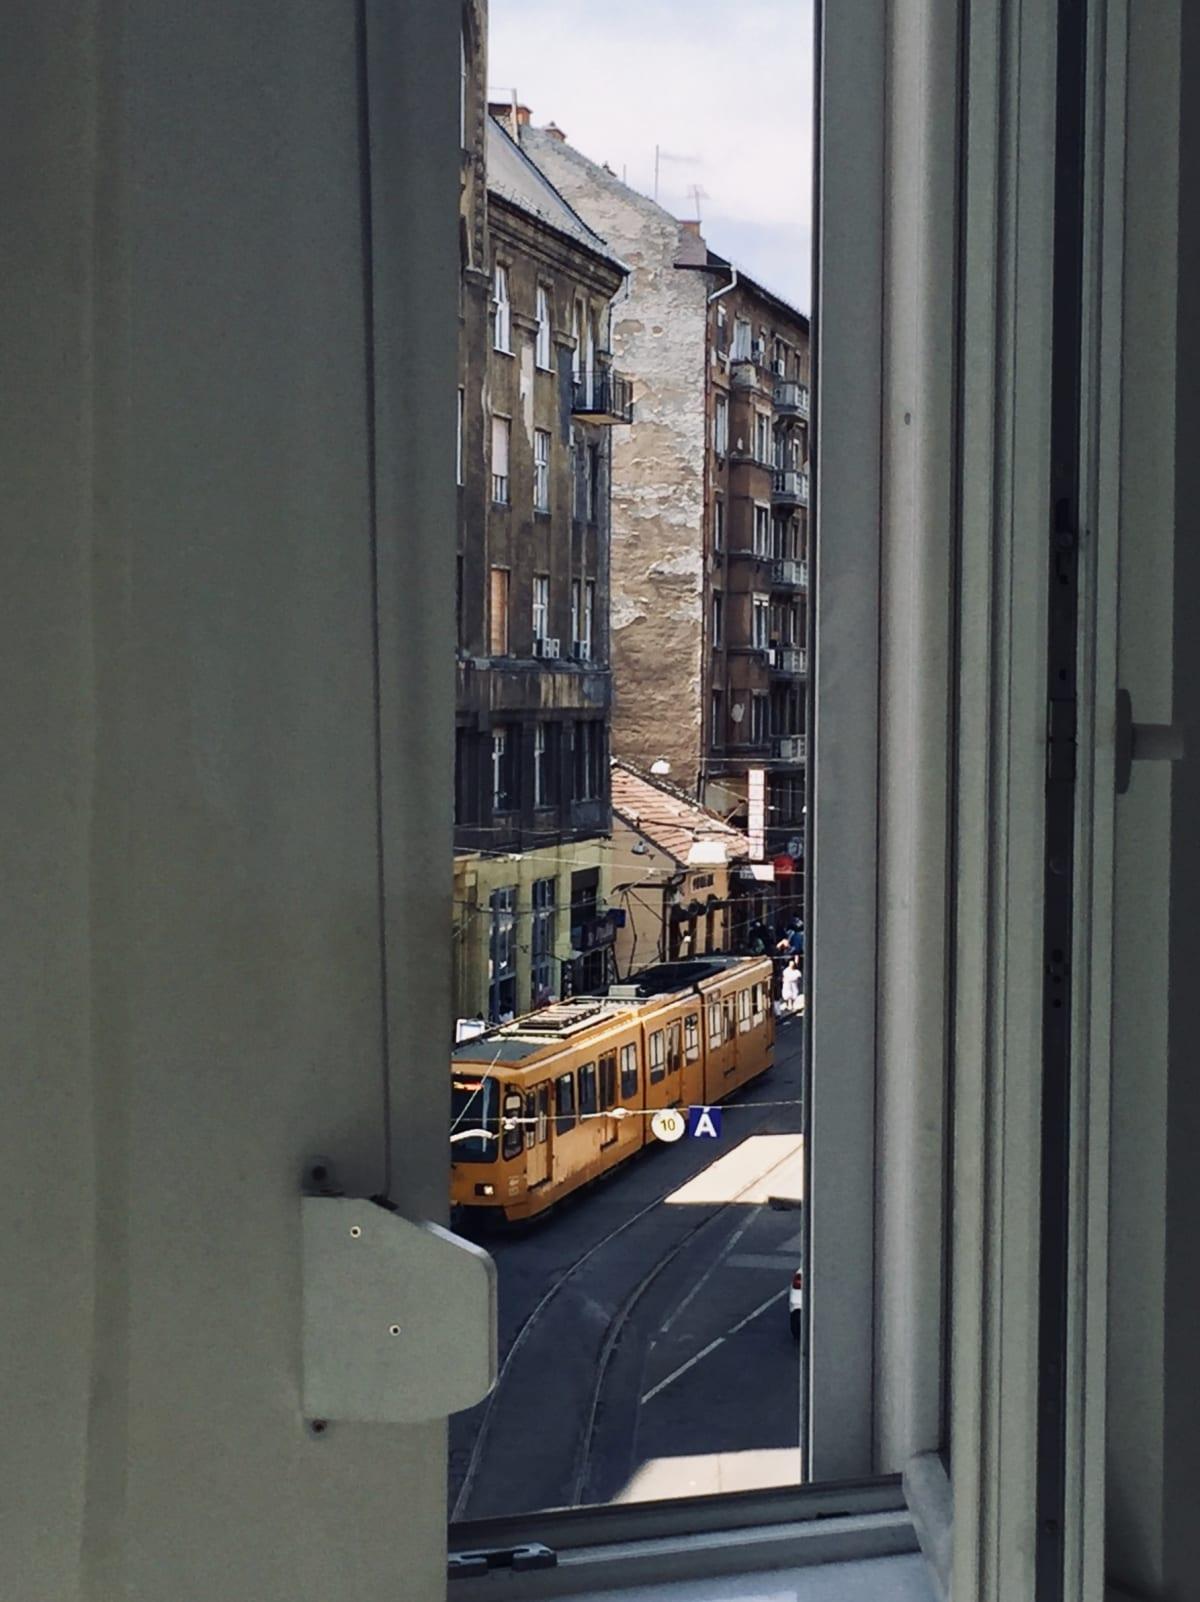 GrandBackpackers, Budapest, Hungary